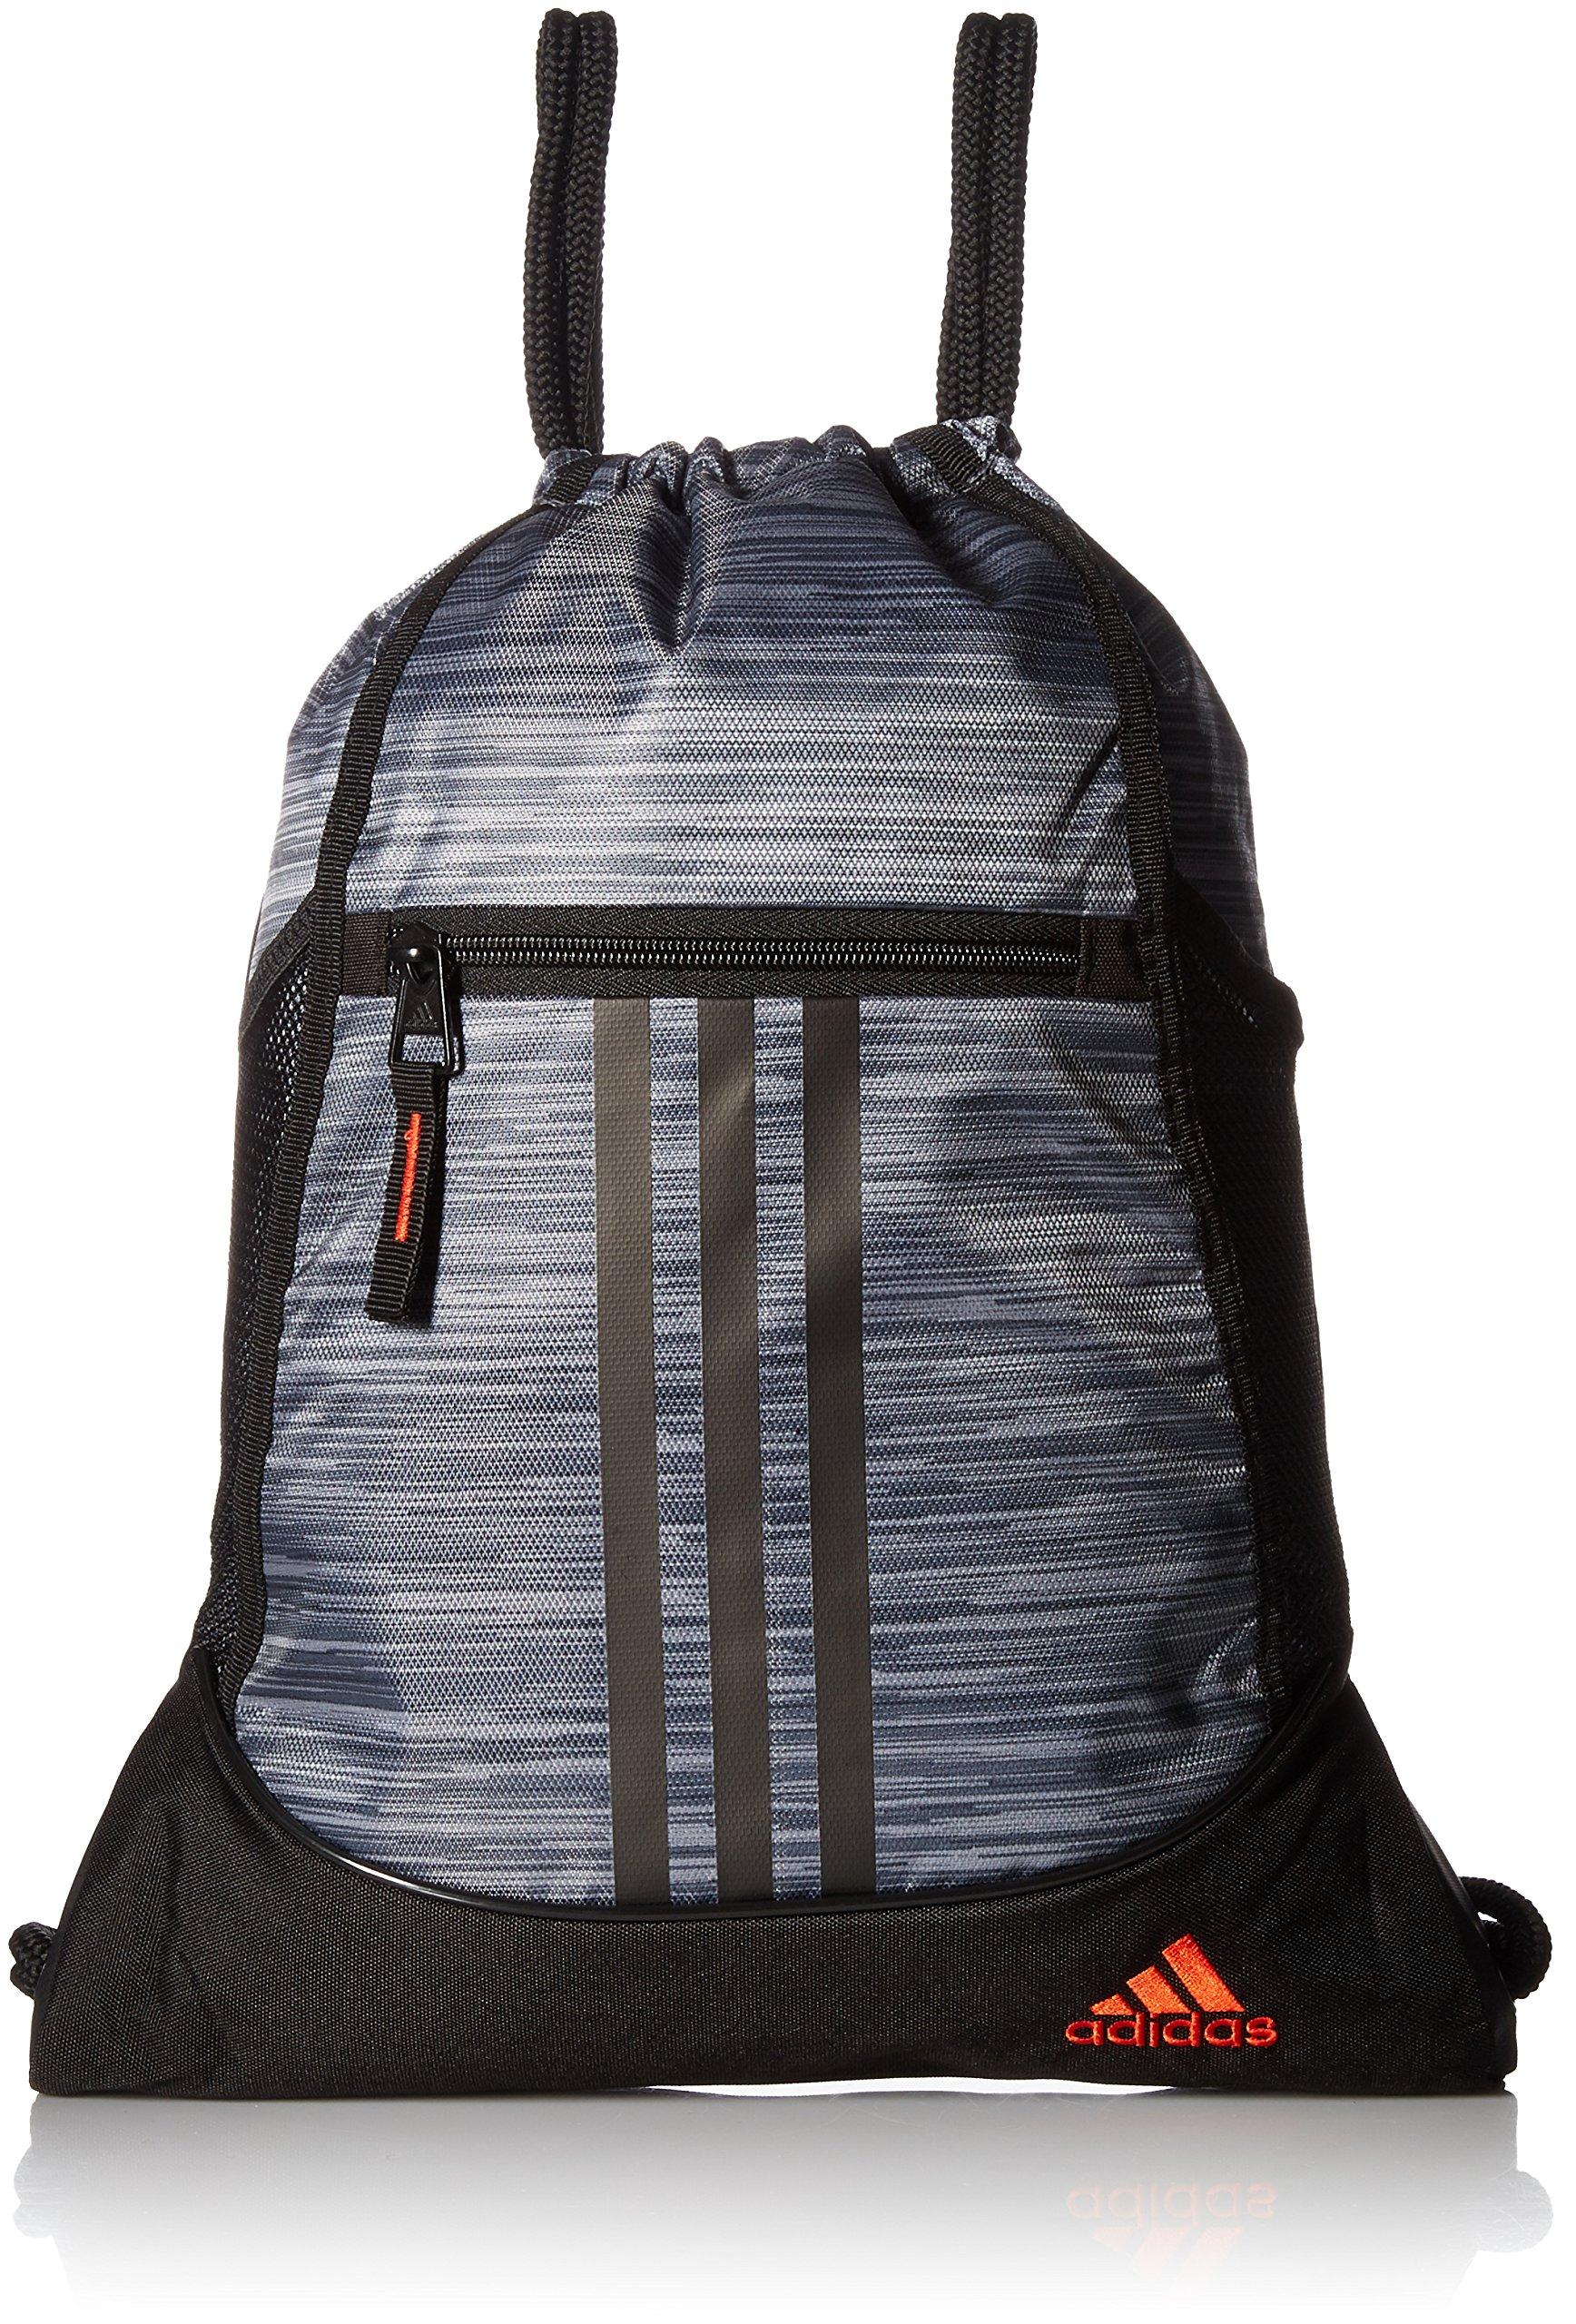 adidas Alliance II Sack Pack, One Size, Onix Looper/Black/Blaze Orange